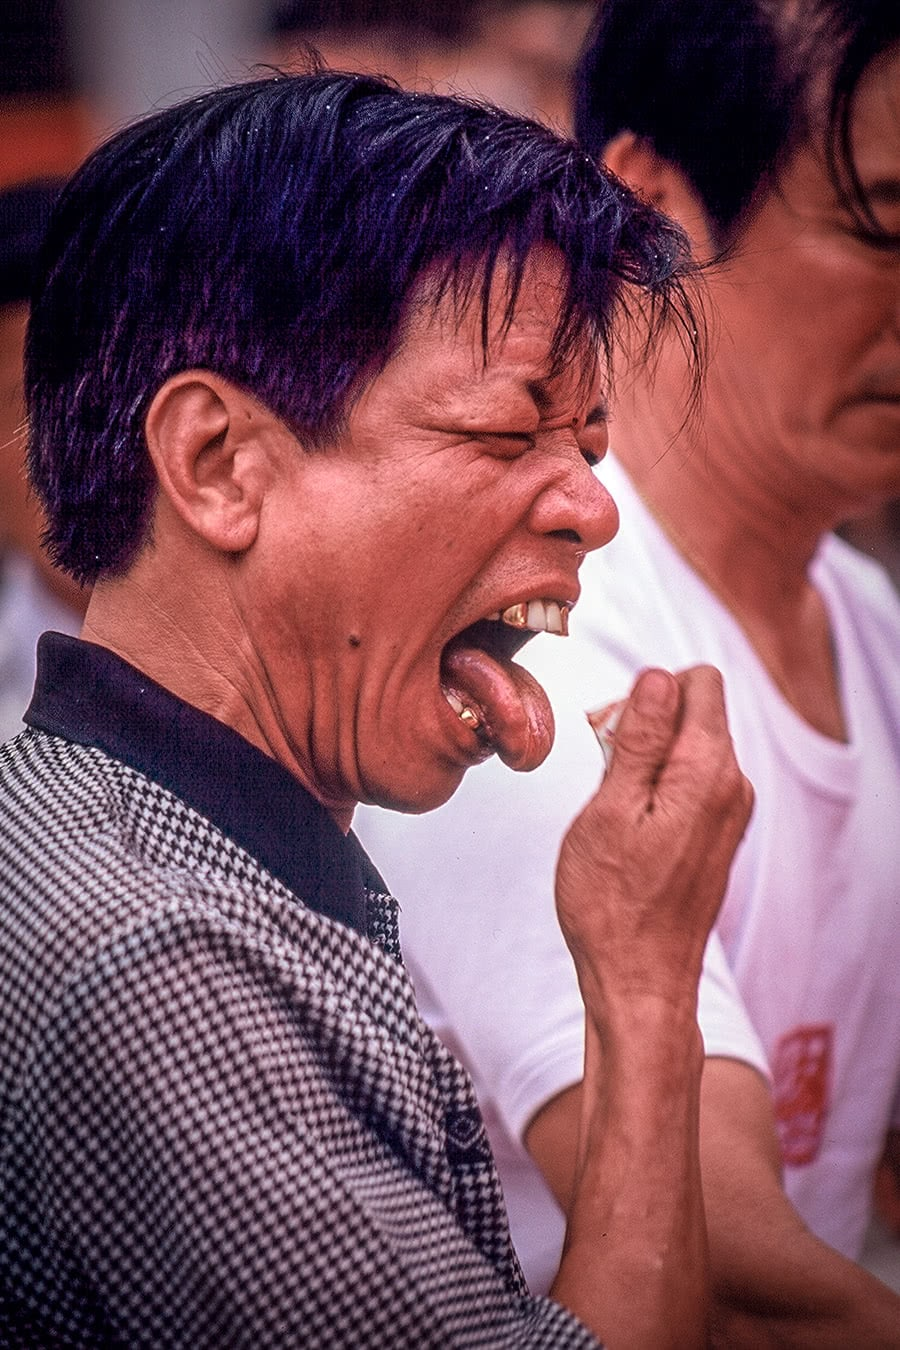 An entranced monkey god medium cuts his tongue with glass in Hong Kong.